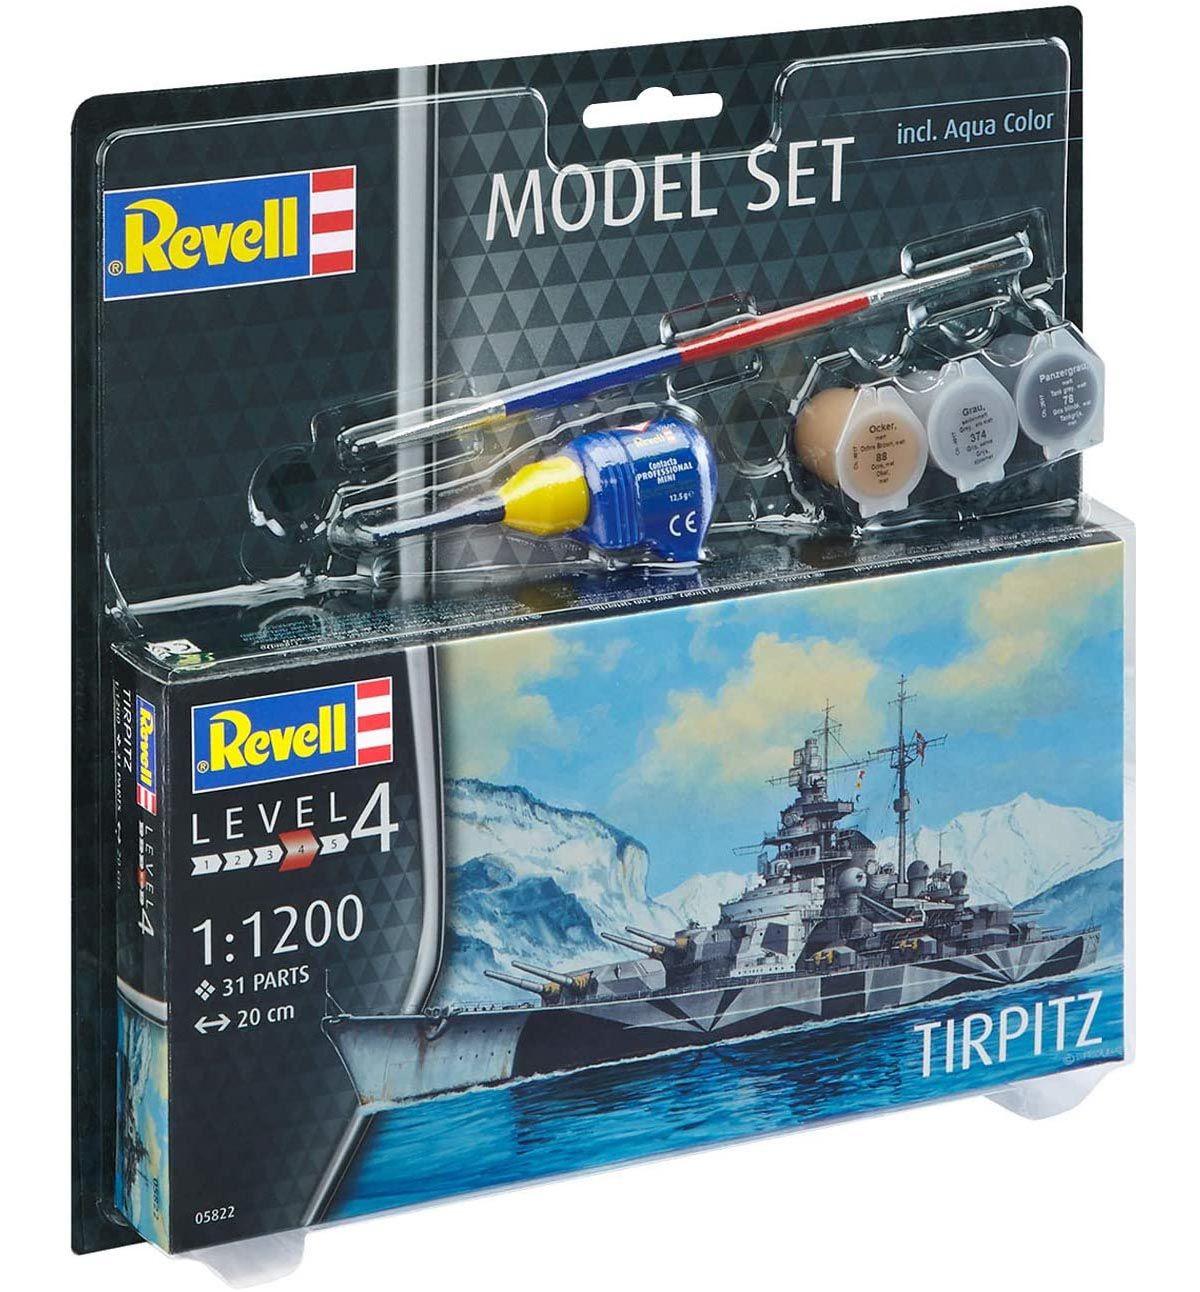 Model Set Tirpitz - 1/1200 - Revell 65822  - BLIMPS COMÉRCIO ELETRÔNICO